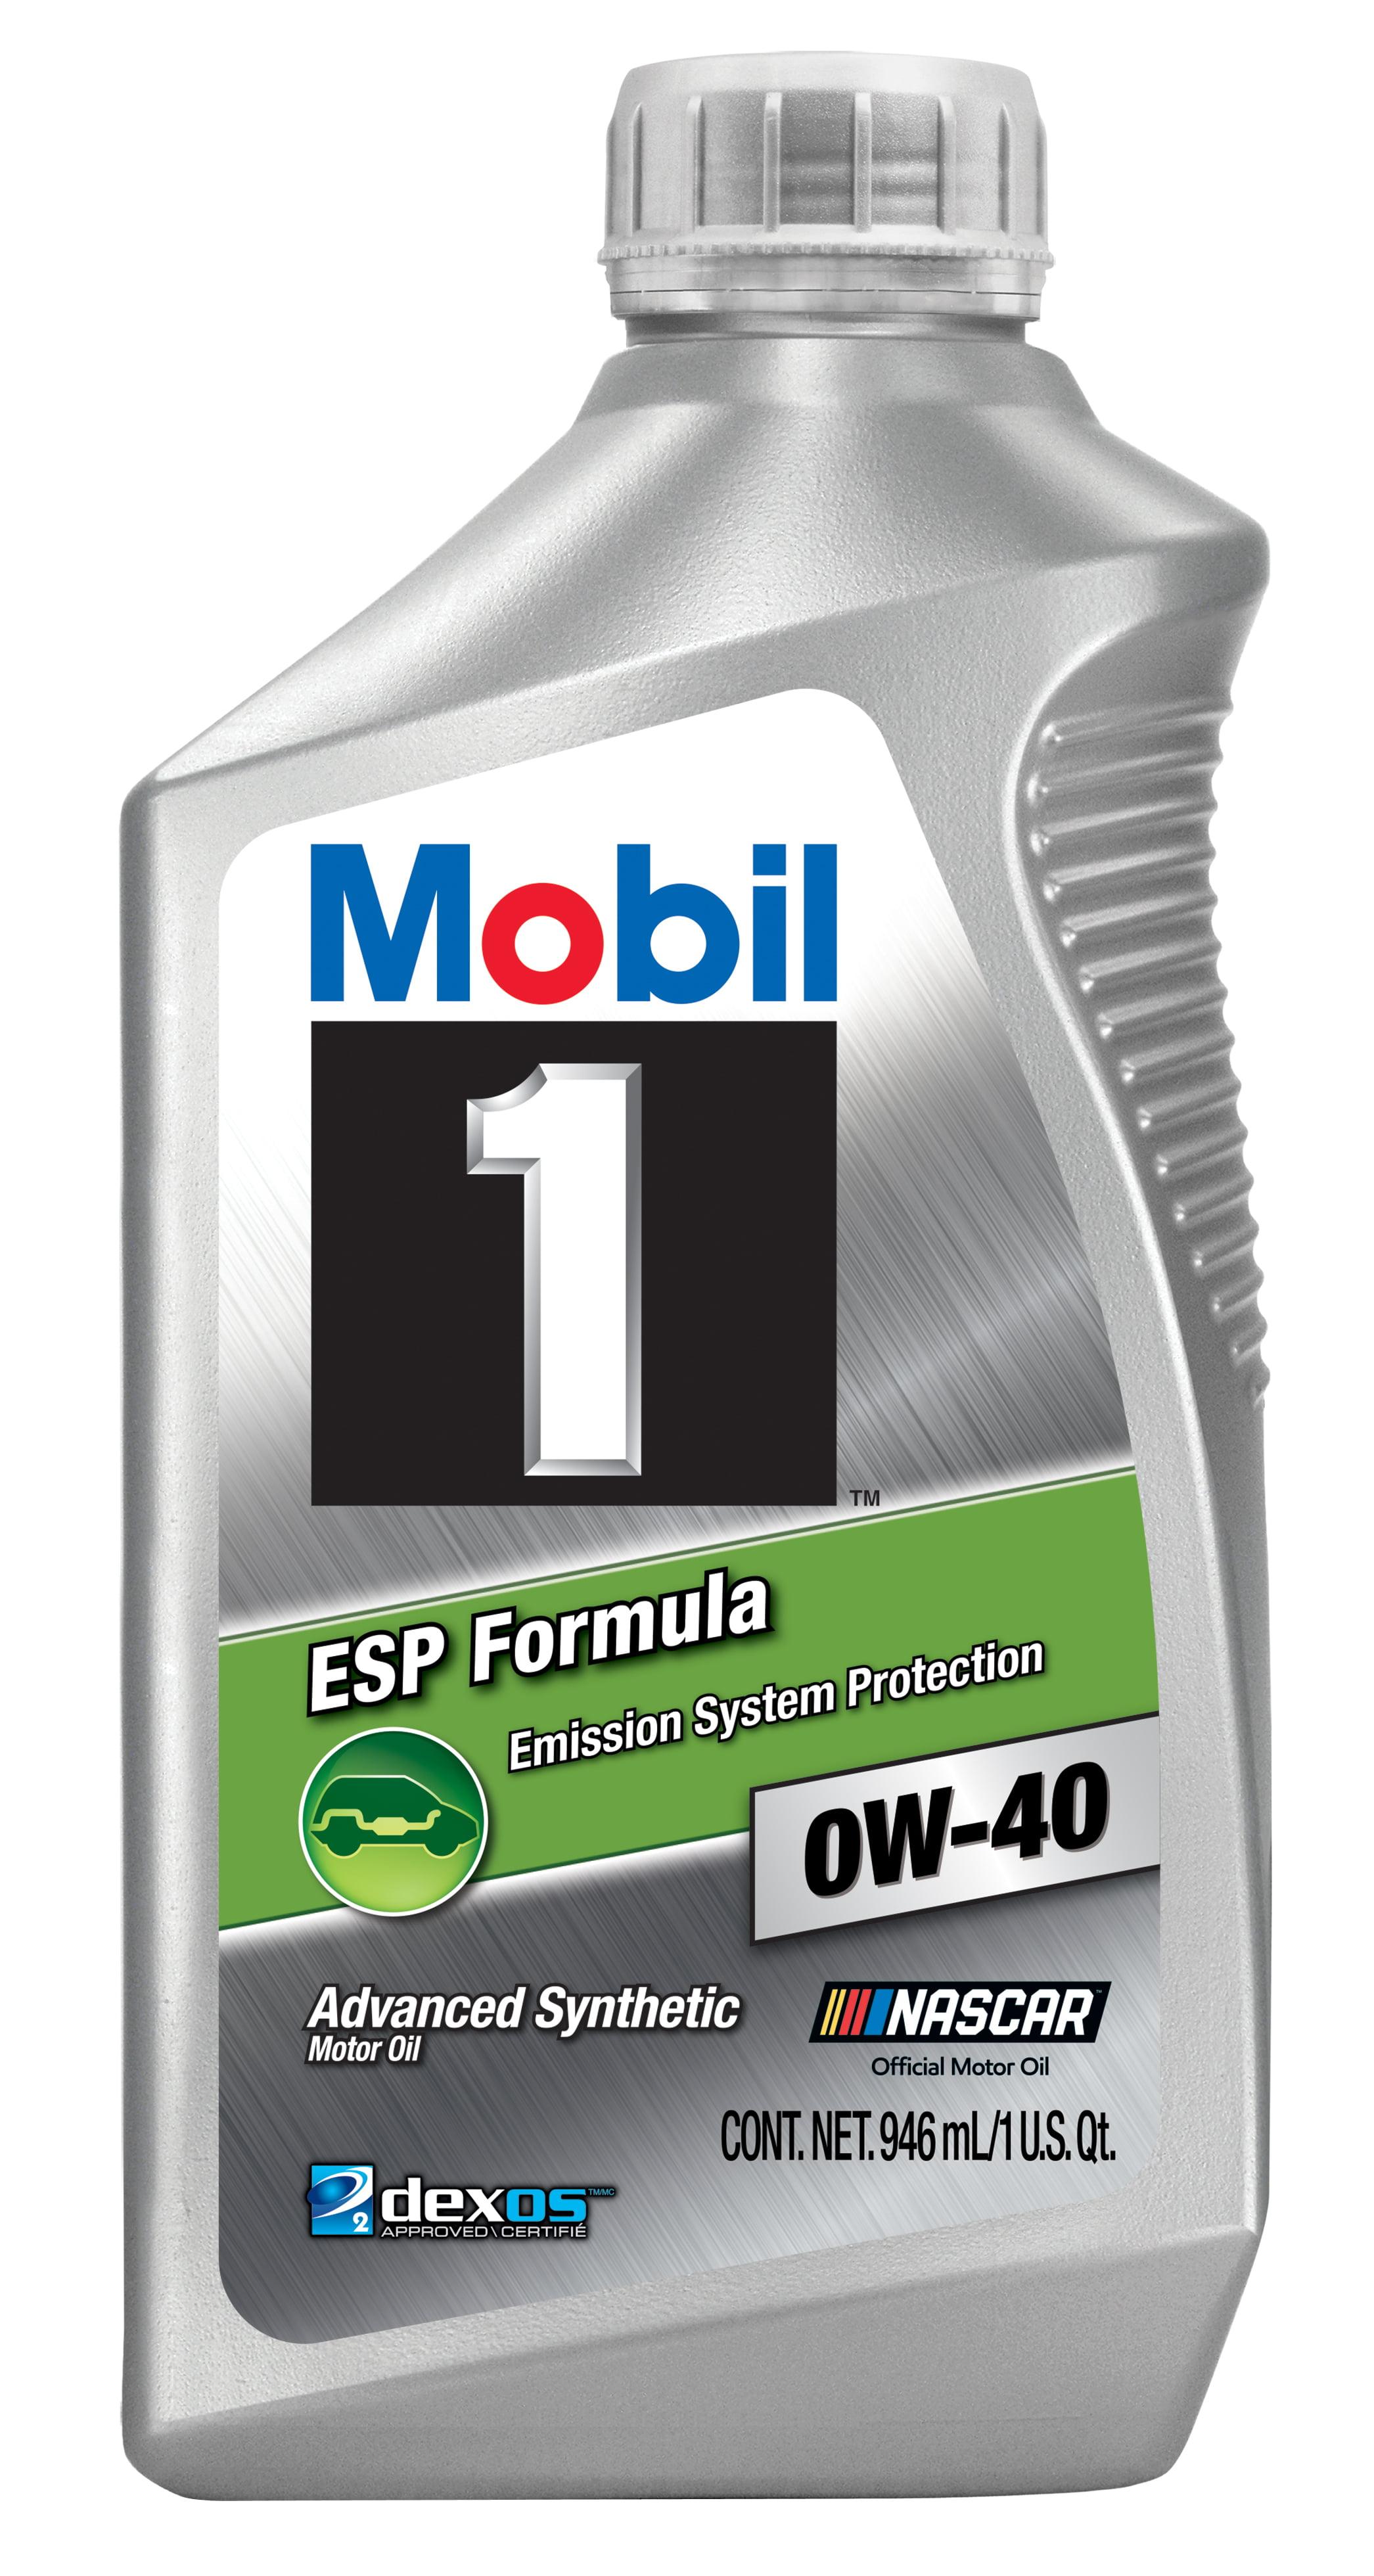 Mobil 1 Now the Official Motor Oil for Chevrolet